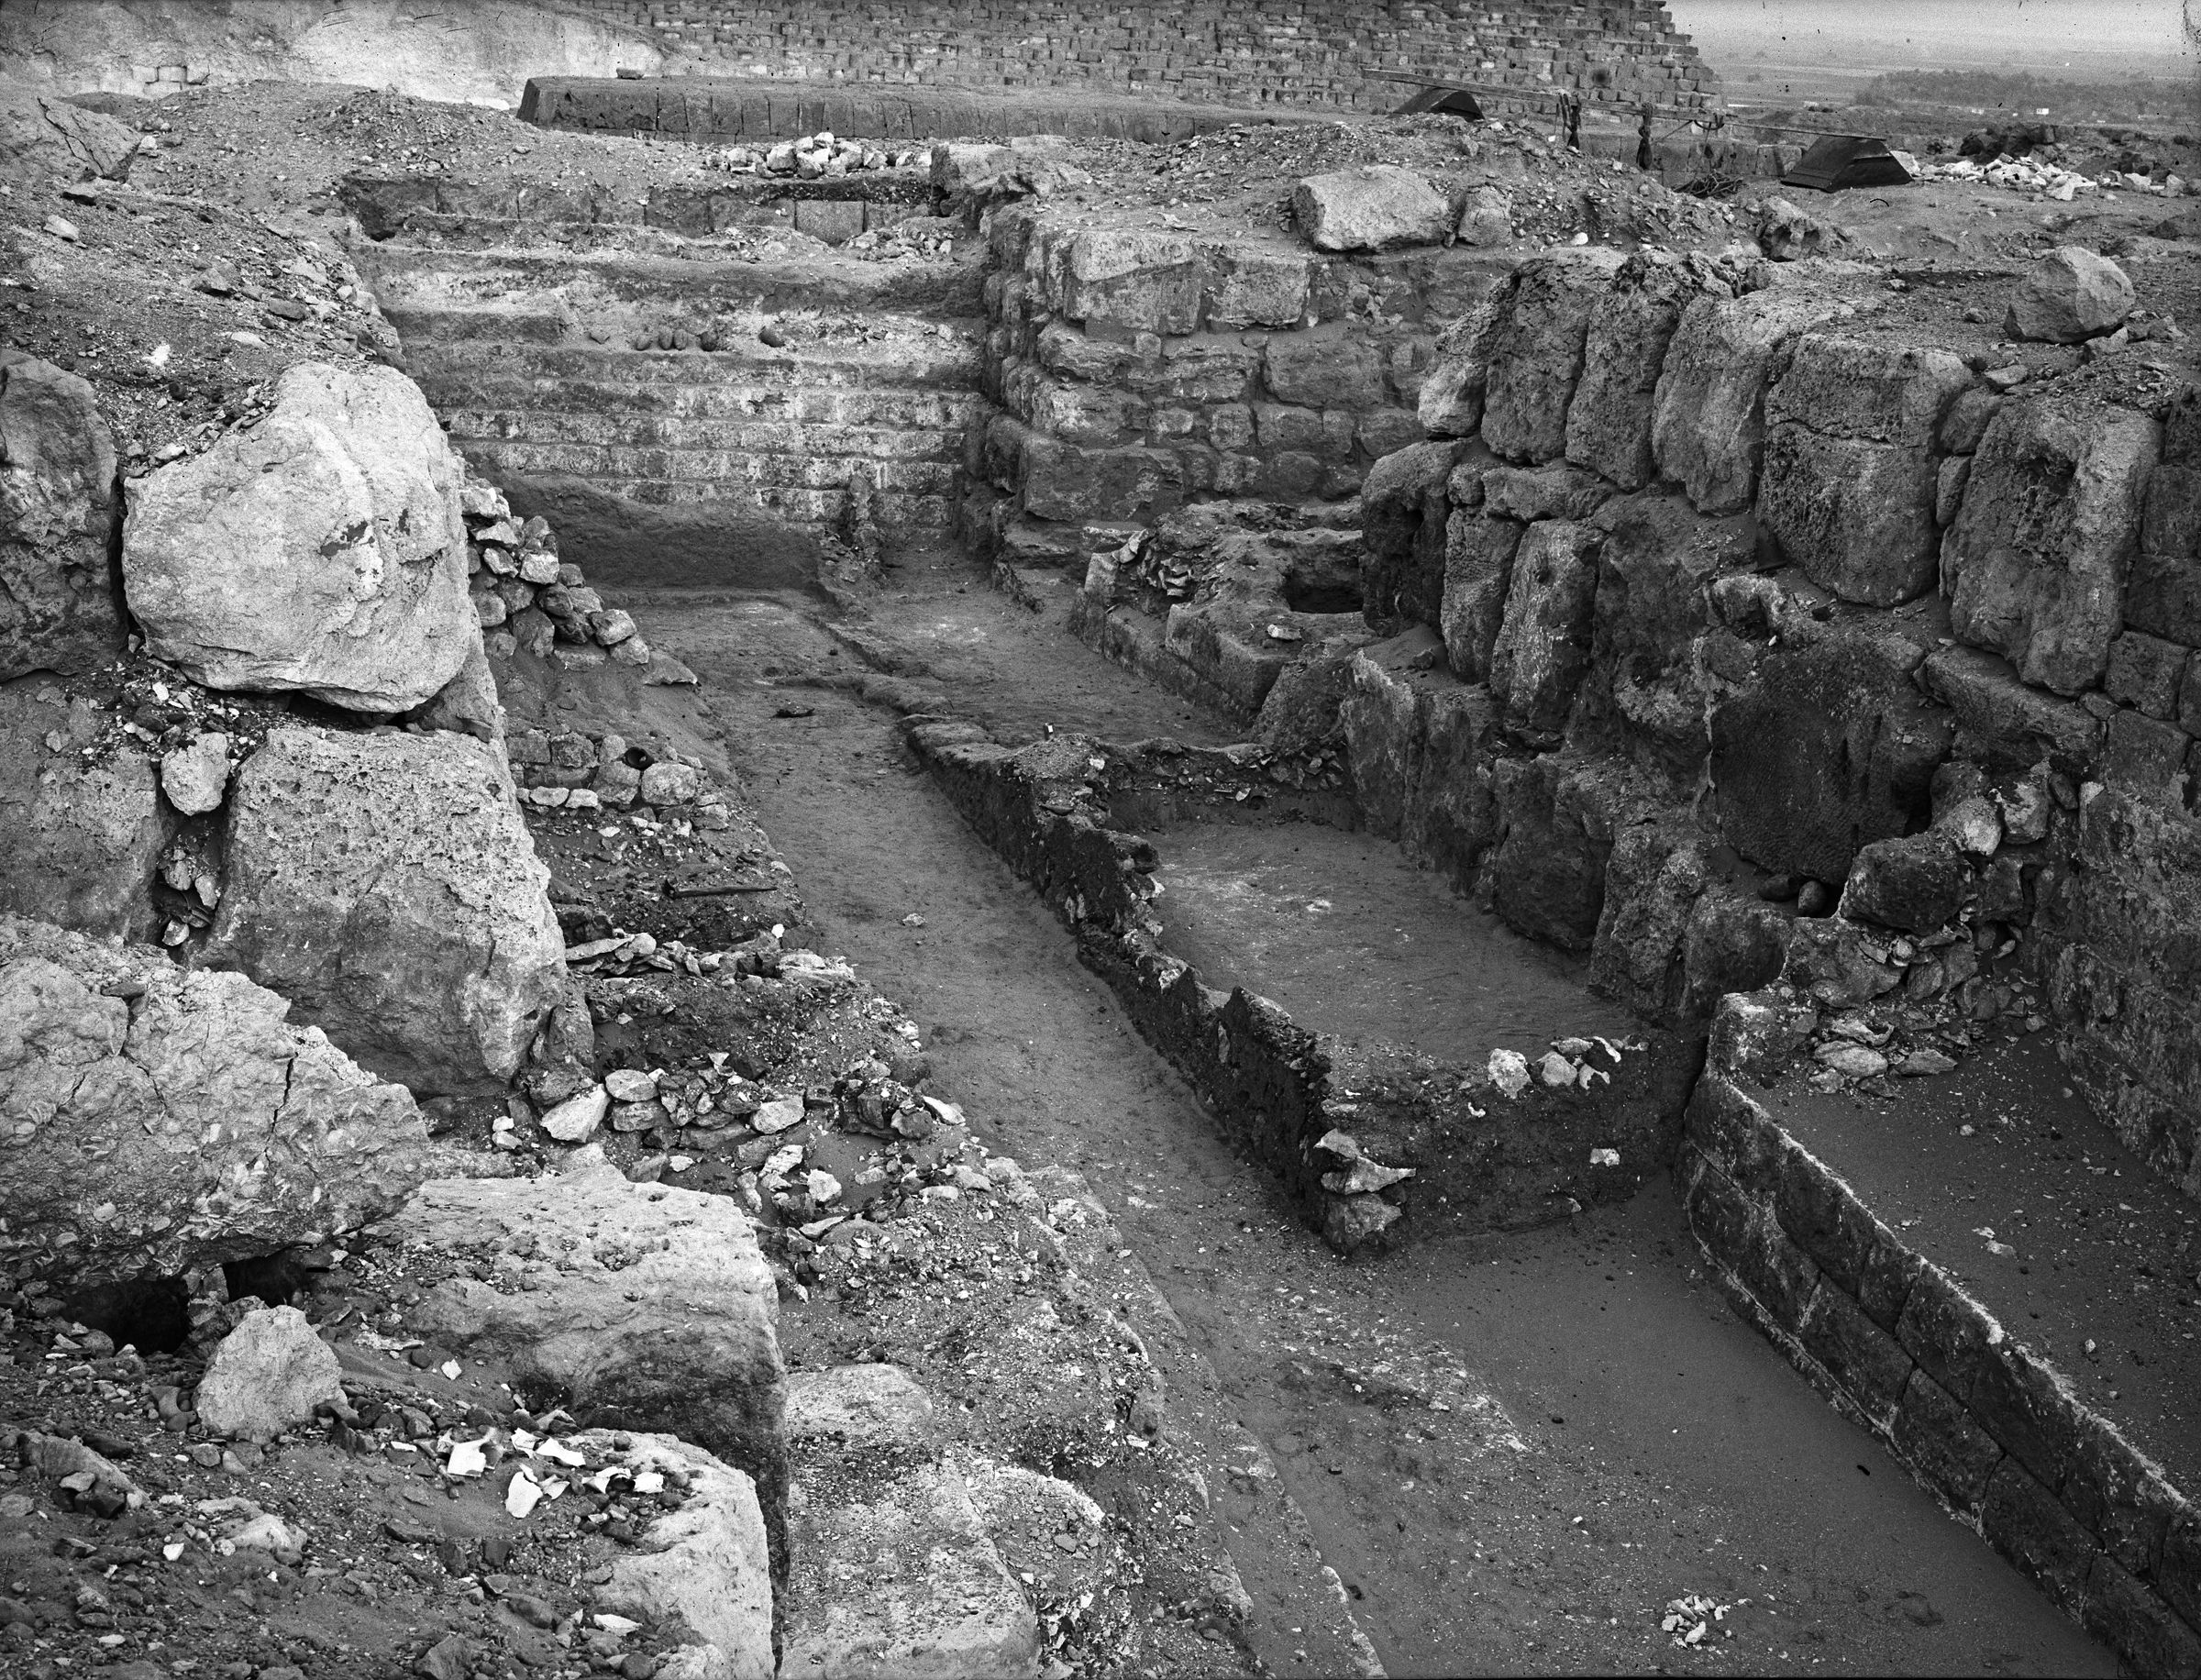 Western Cemetery: Site: Giza; View: G 4740, G 4730, G 4840, G 4830, G 4831